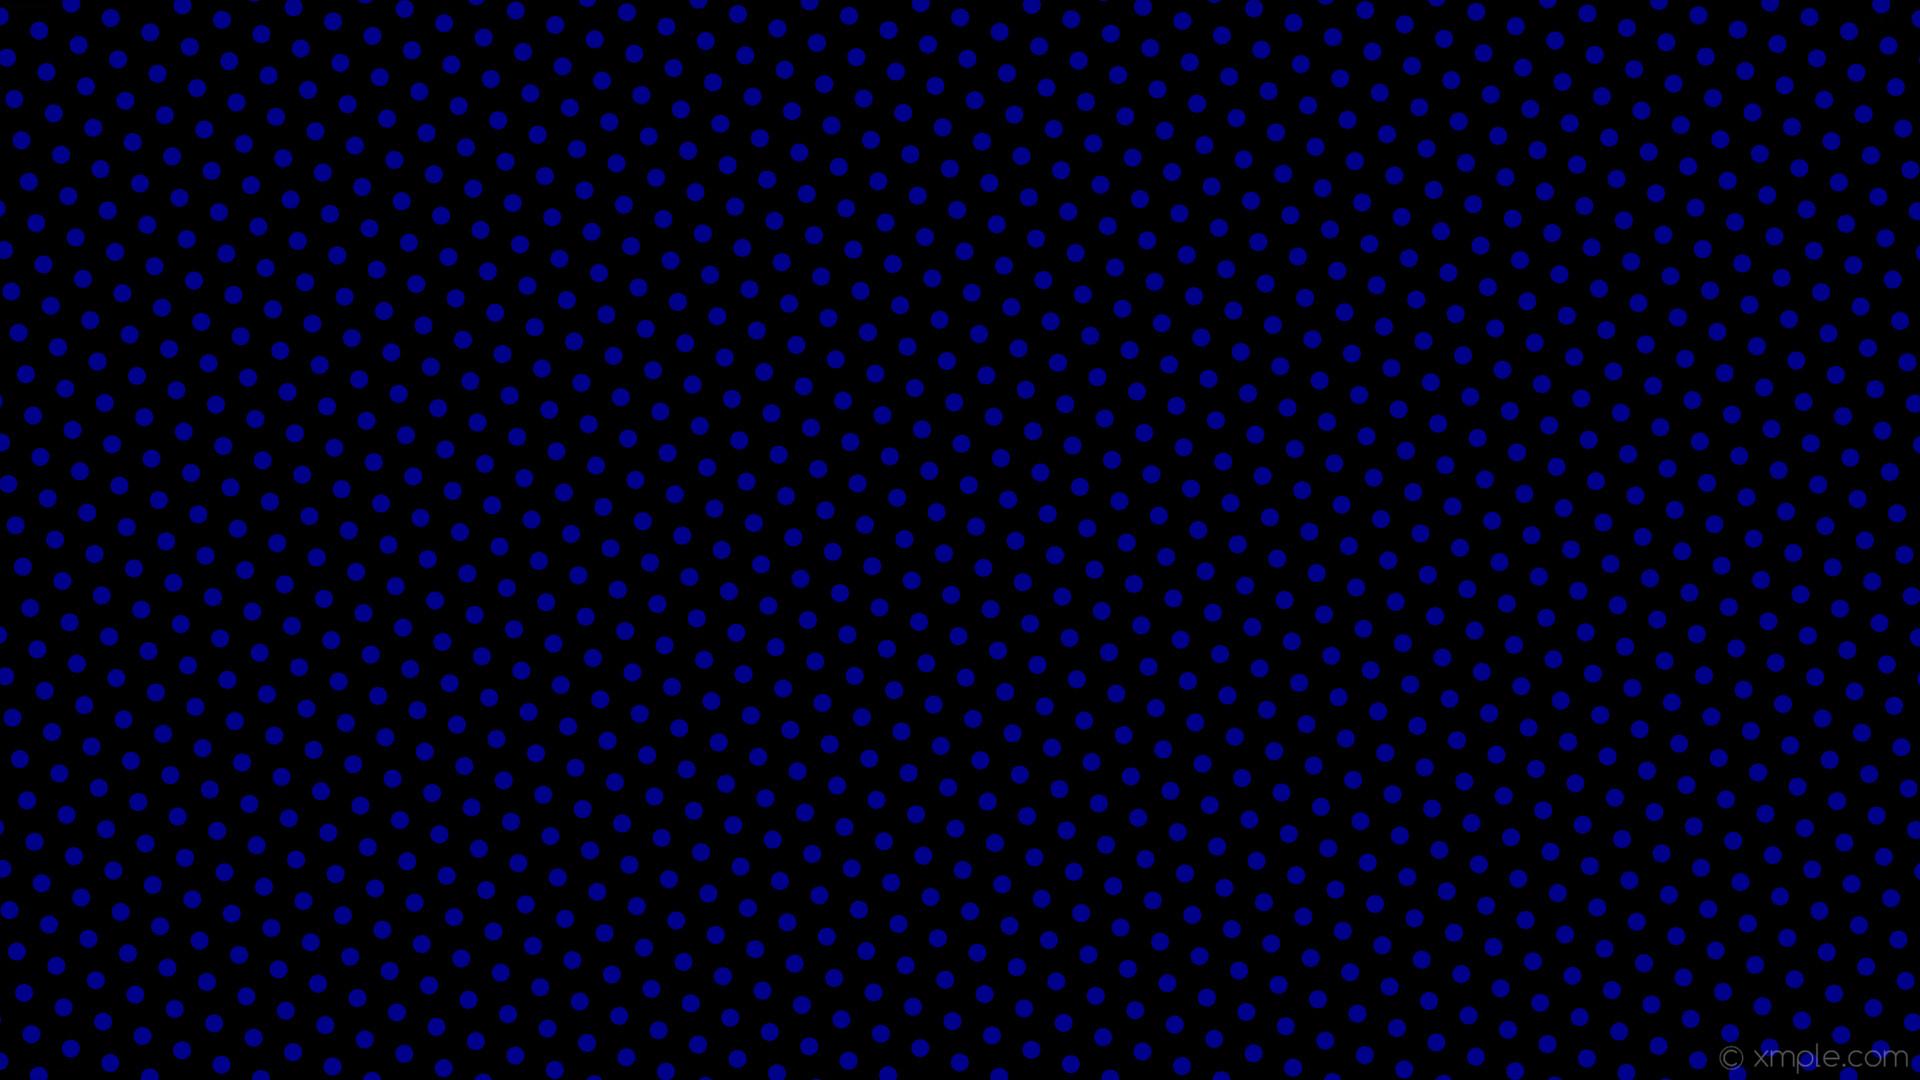 wallpaper blue black hexagon polka dots dark blue #000000 #00008b diagonal  40° 18px